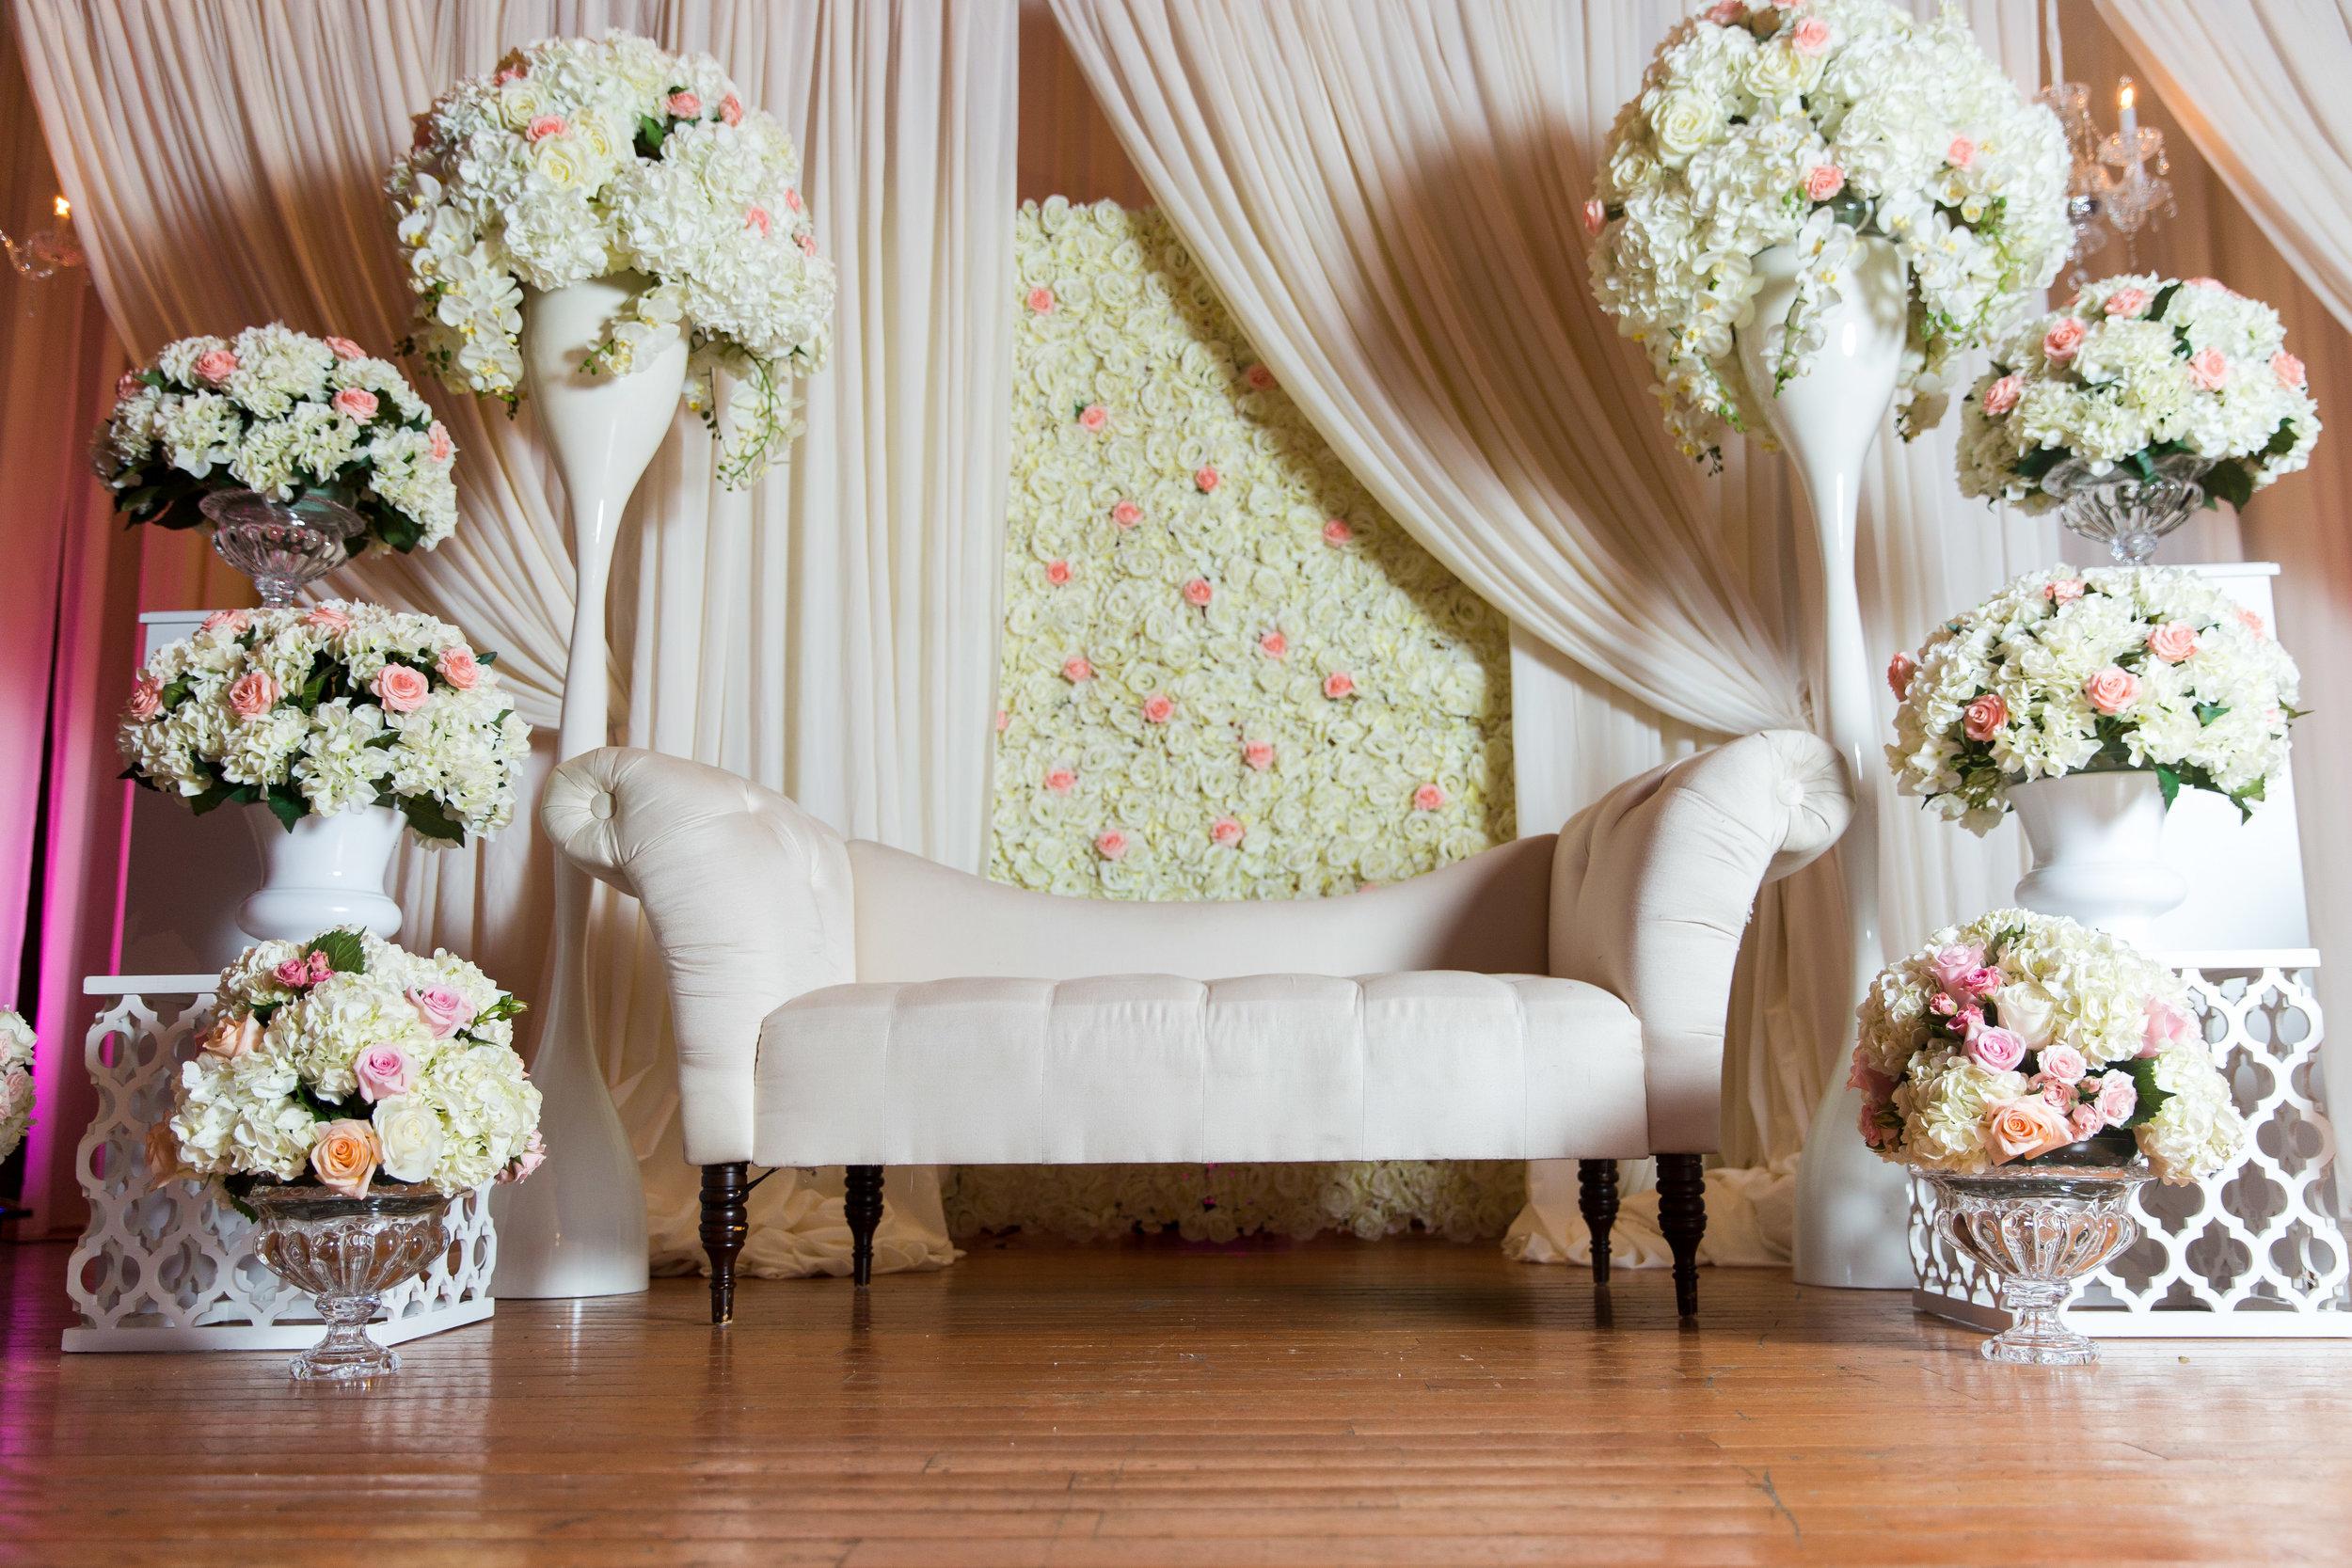 SJ_Wedding_Reception-3 - Copy.jpg